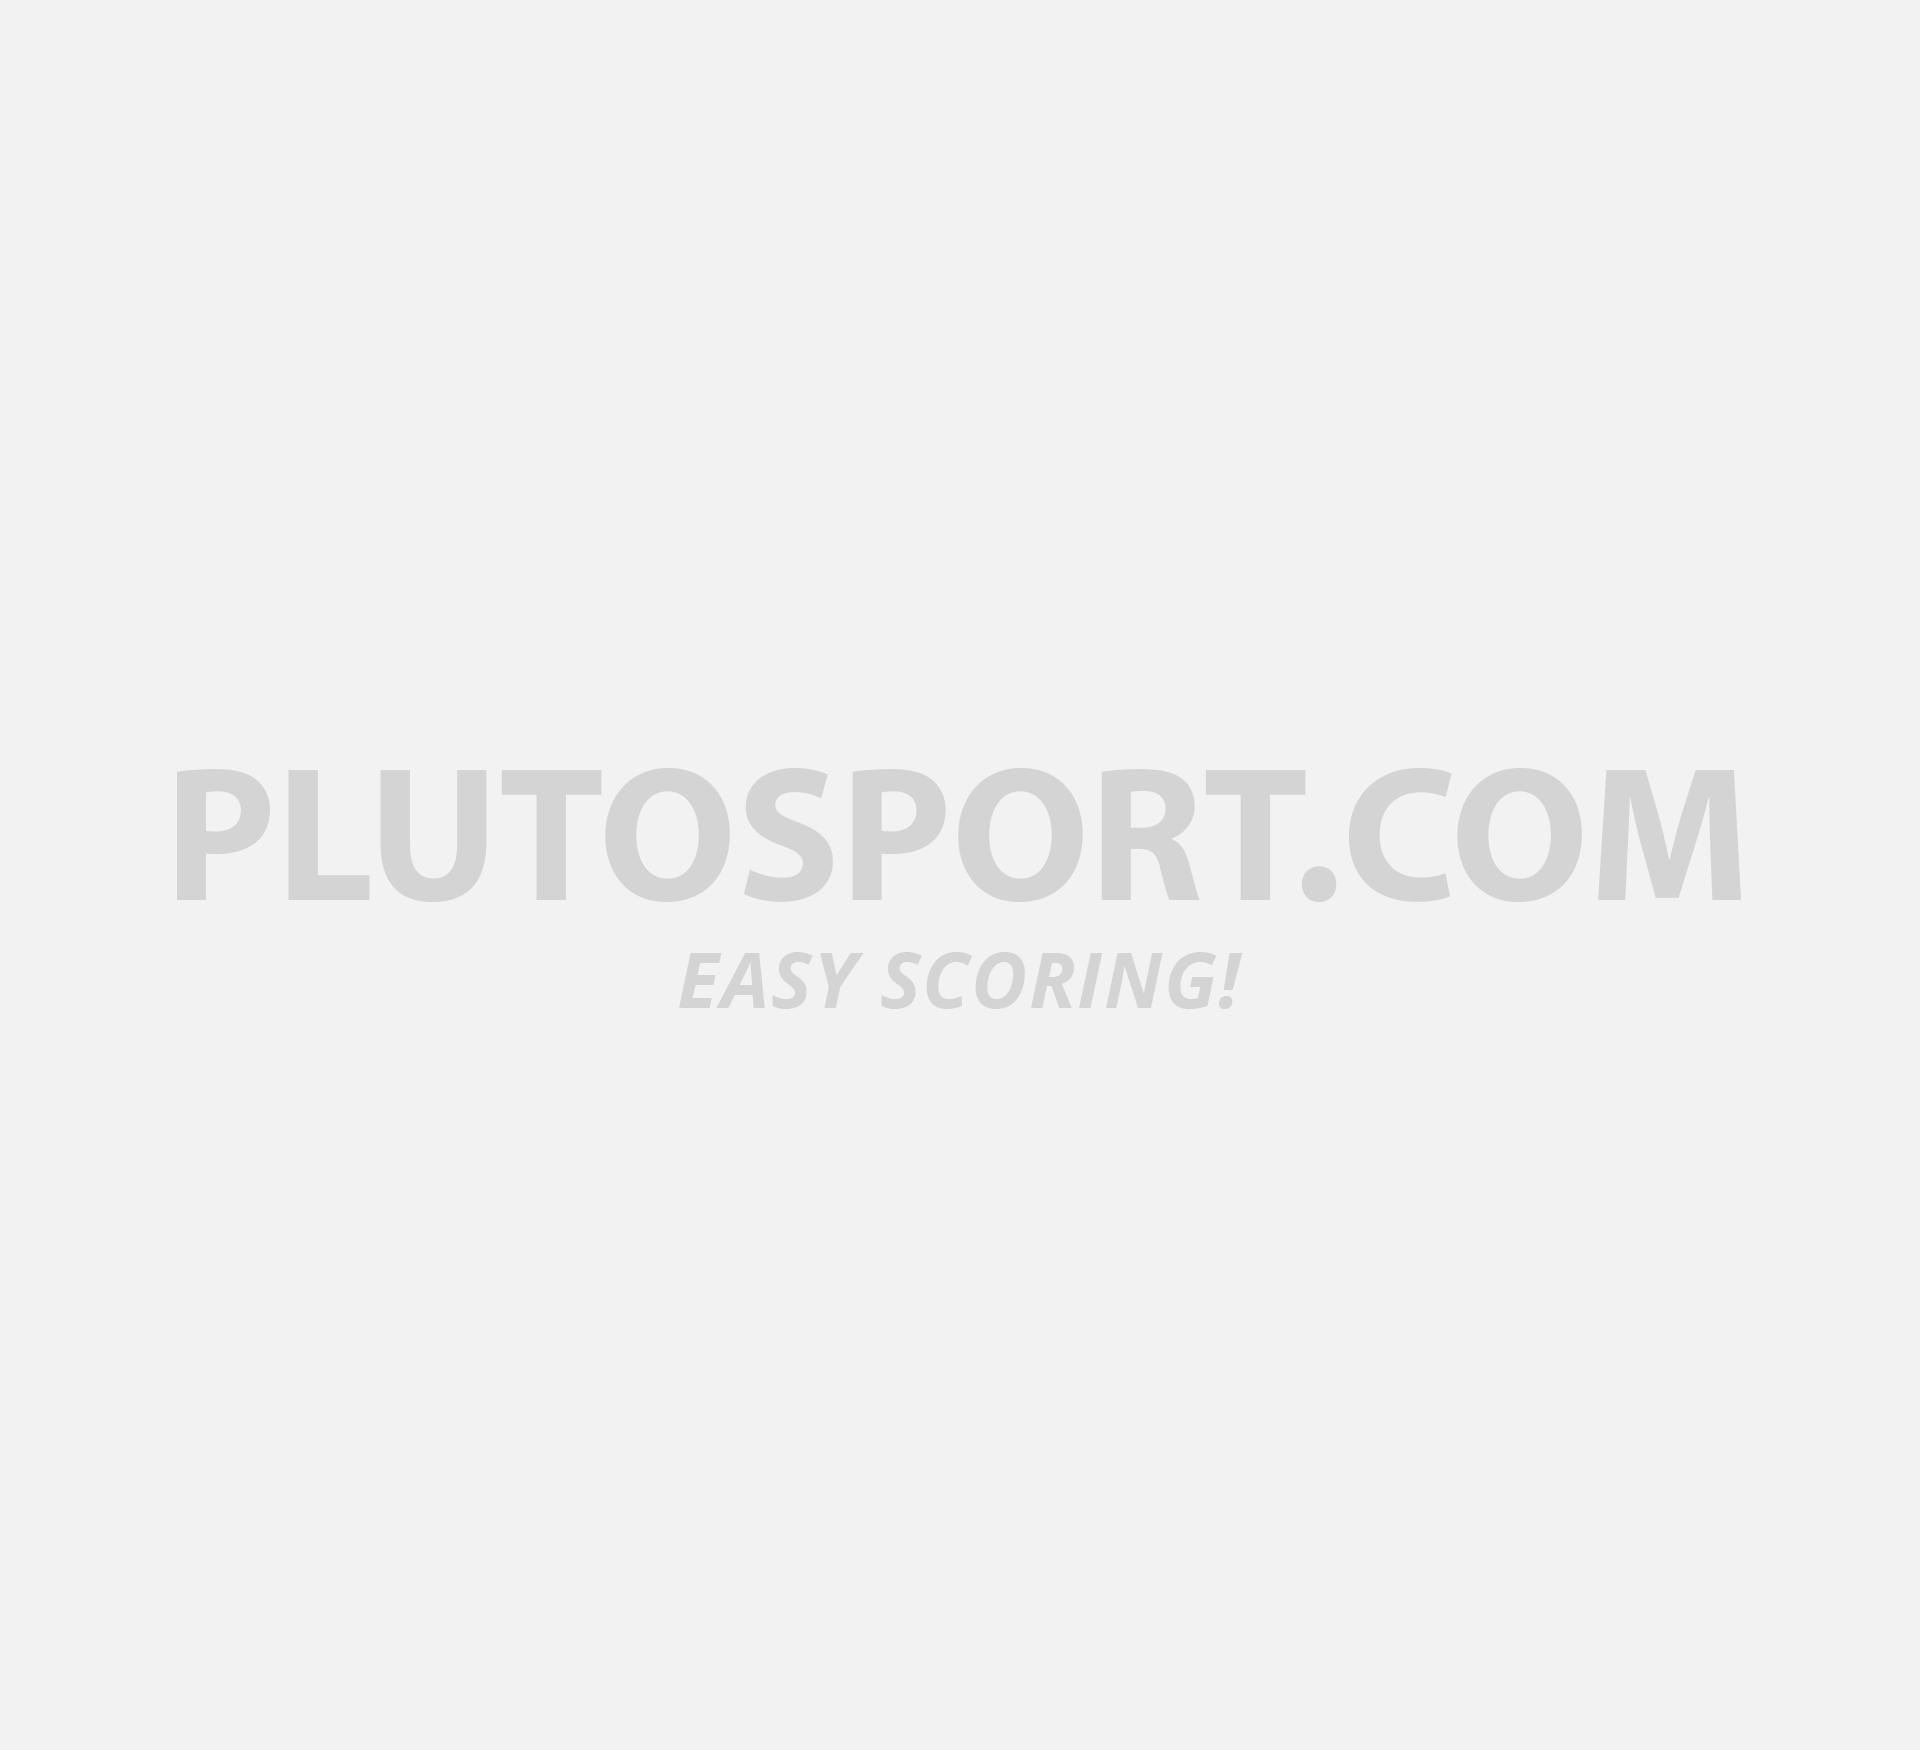 bfacaa582 Stanno Antibacterial Tubes - Guard stay - Shin guards - Football - Sports |  Plutosport